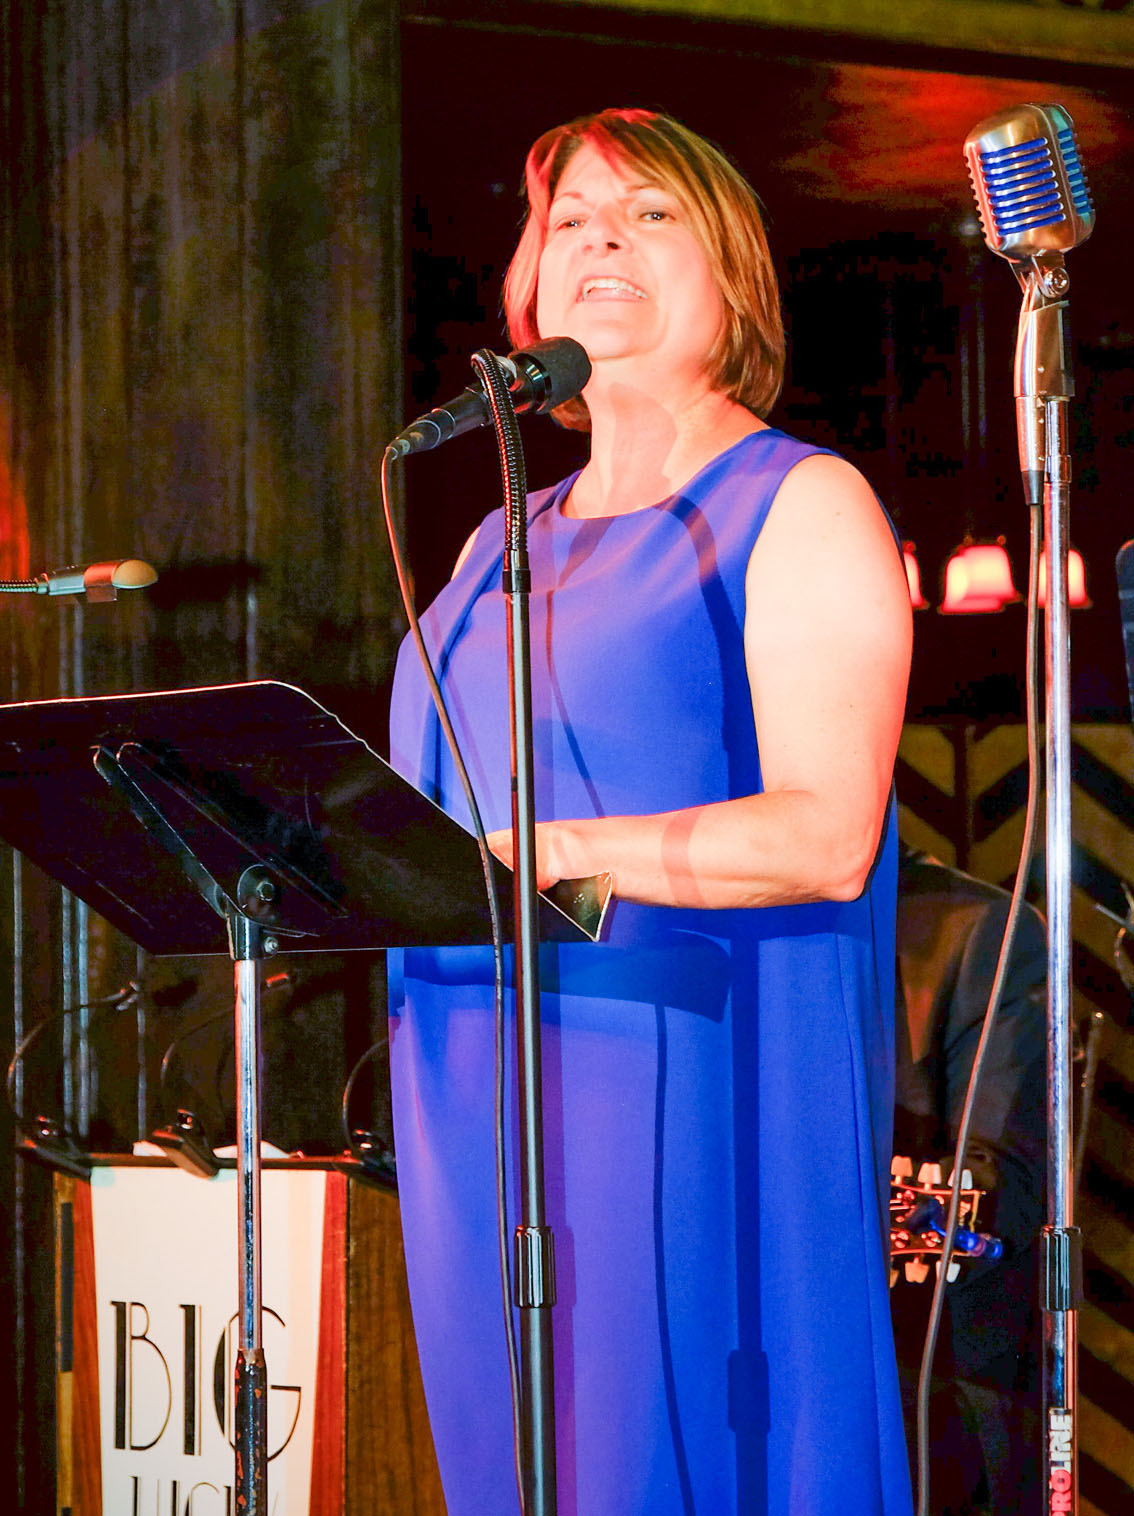 AMPTP President Carol Lombardini gives tribute to Ron Kutak. Photo by Wm. Stetz